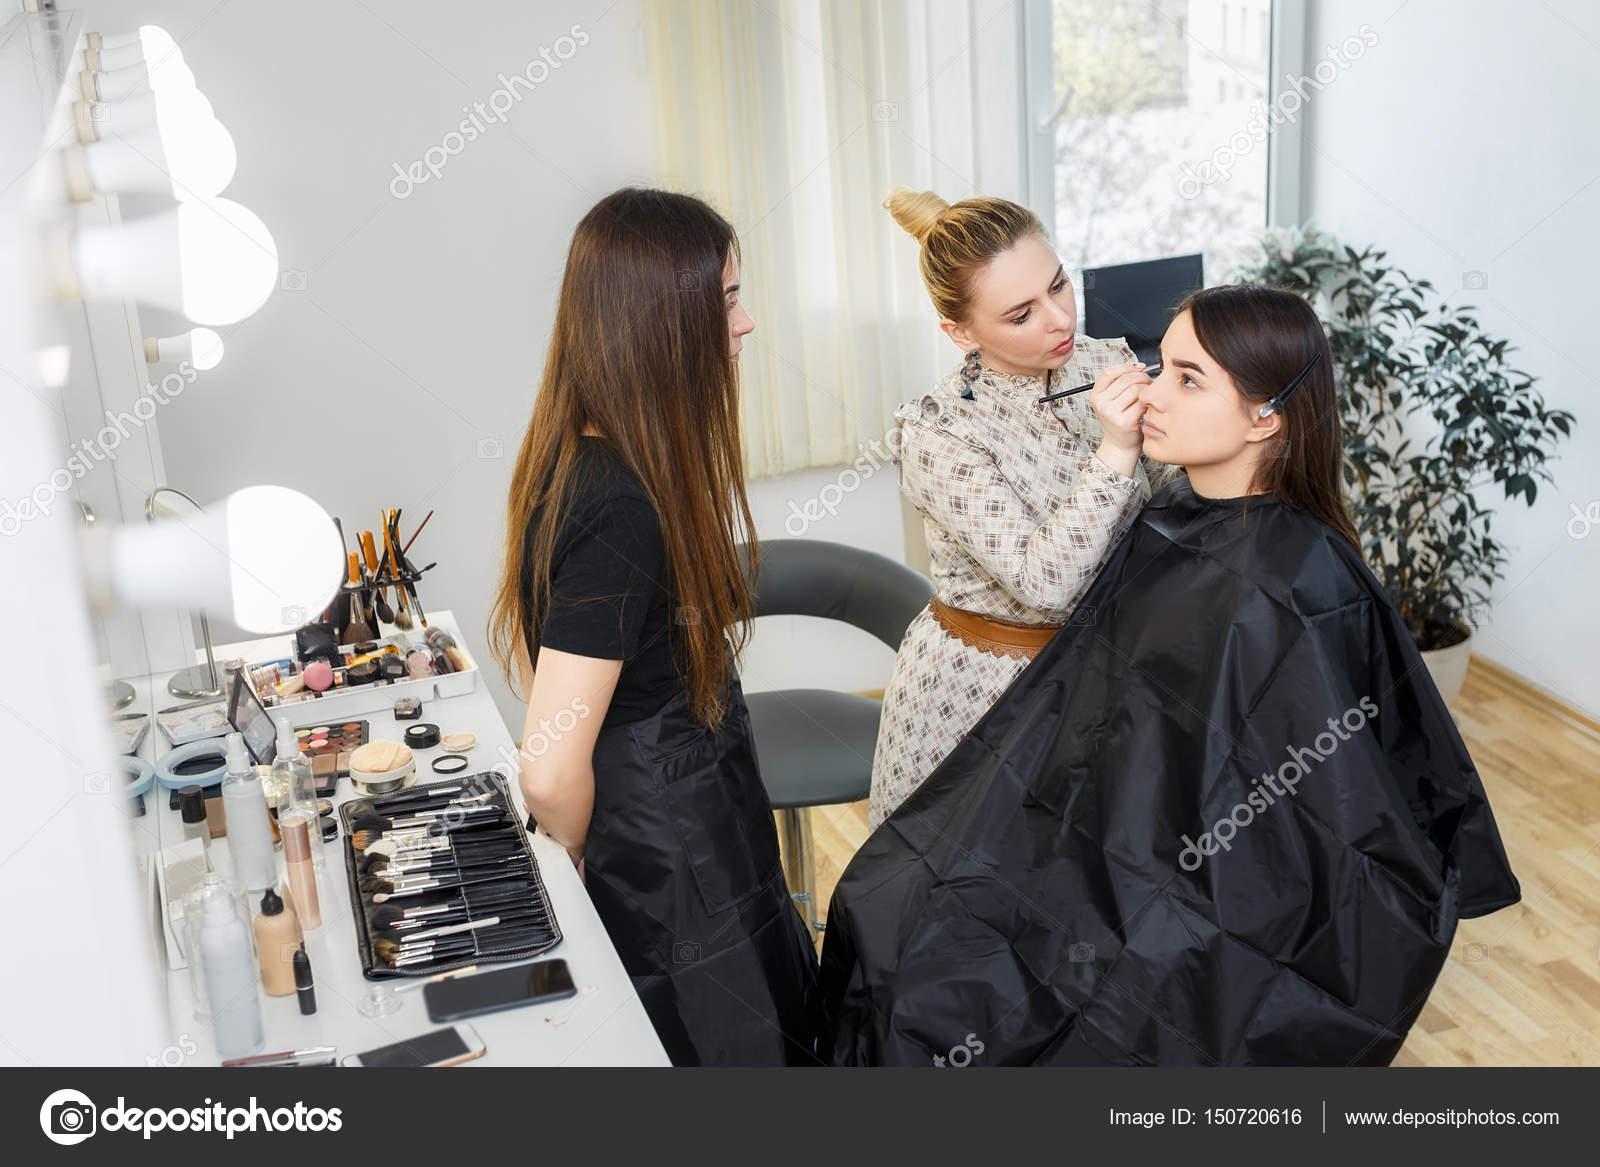 how to become a beauty teacher